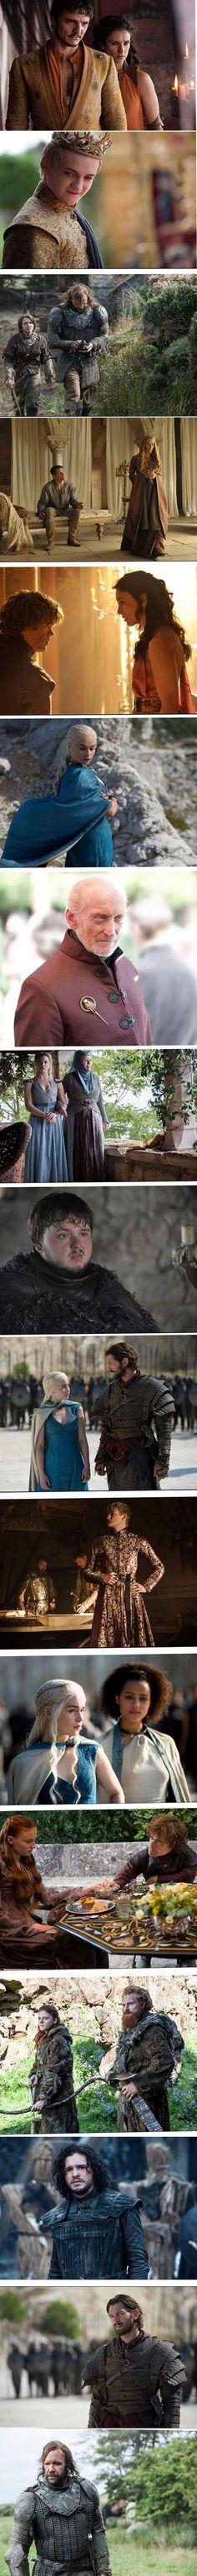 Games of Thrones Saison 4 : Galerie de photos inédites !